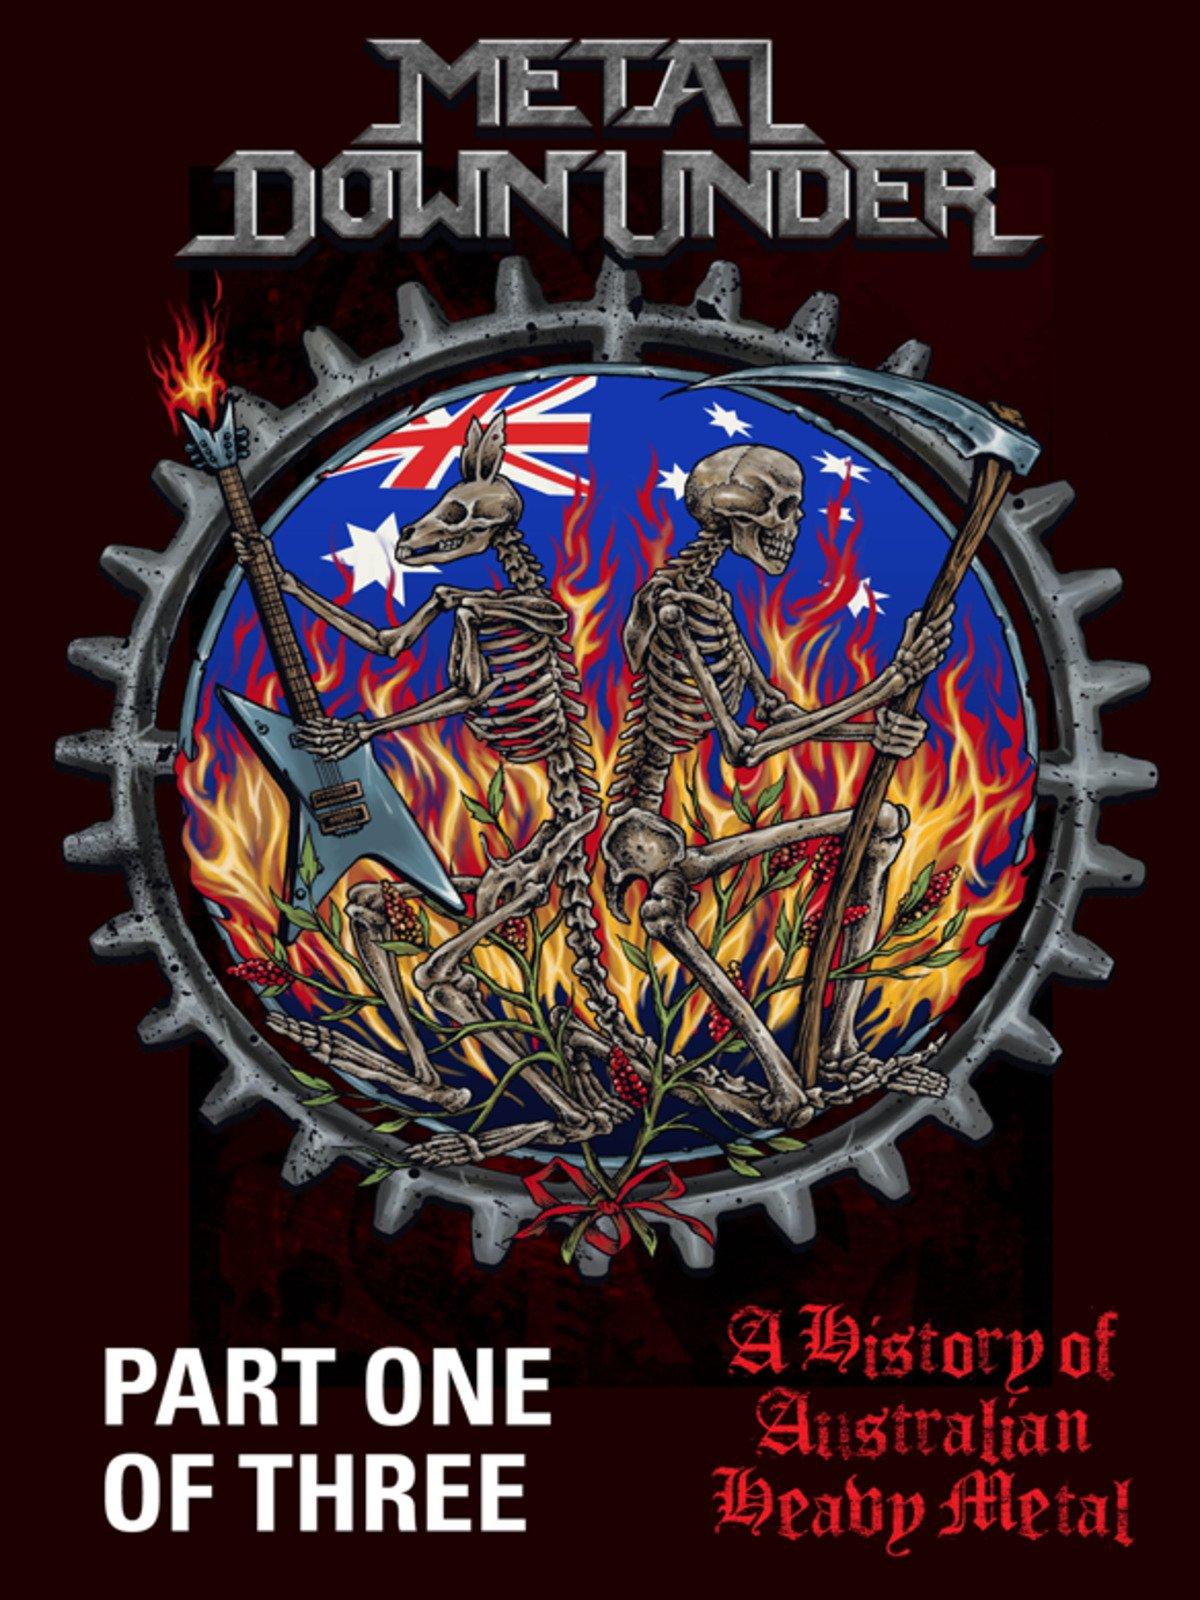 Metal Down Under (A History of Australian Heavy Metal), Part 1